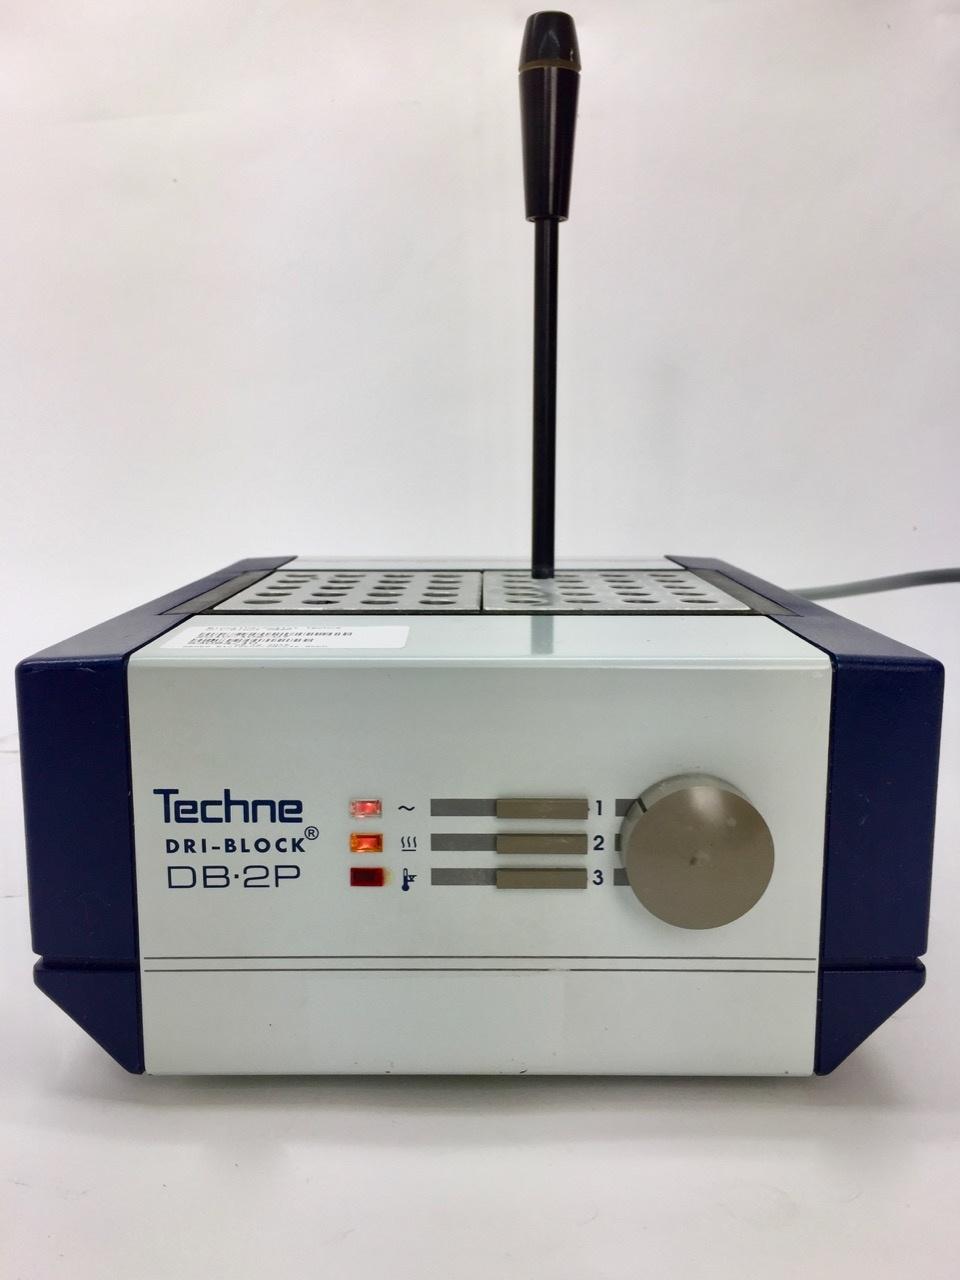 Techne Techne Dri-Block DB2P Blockthermostat